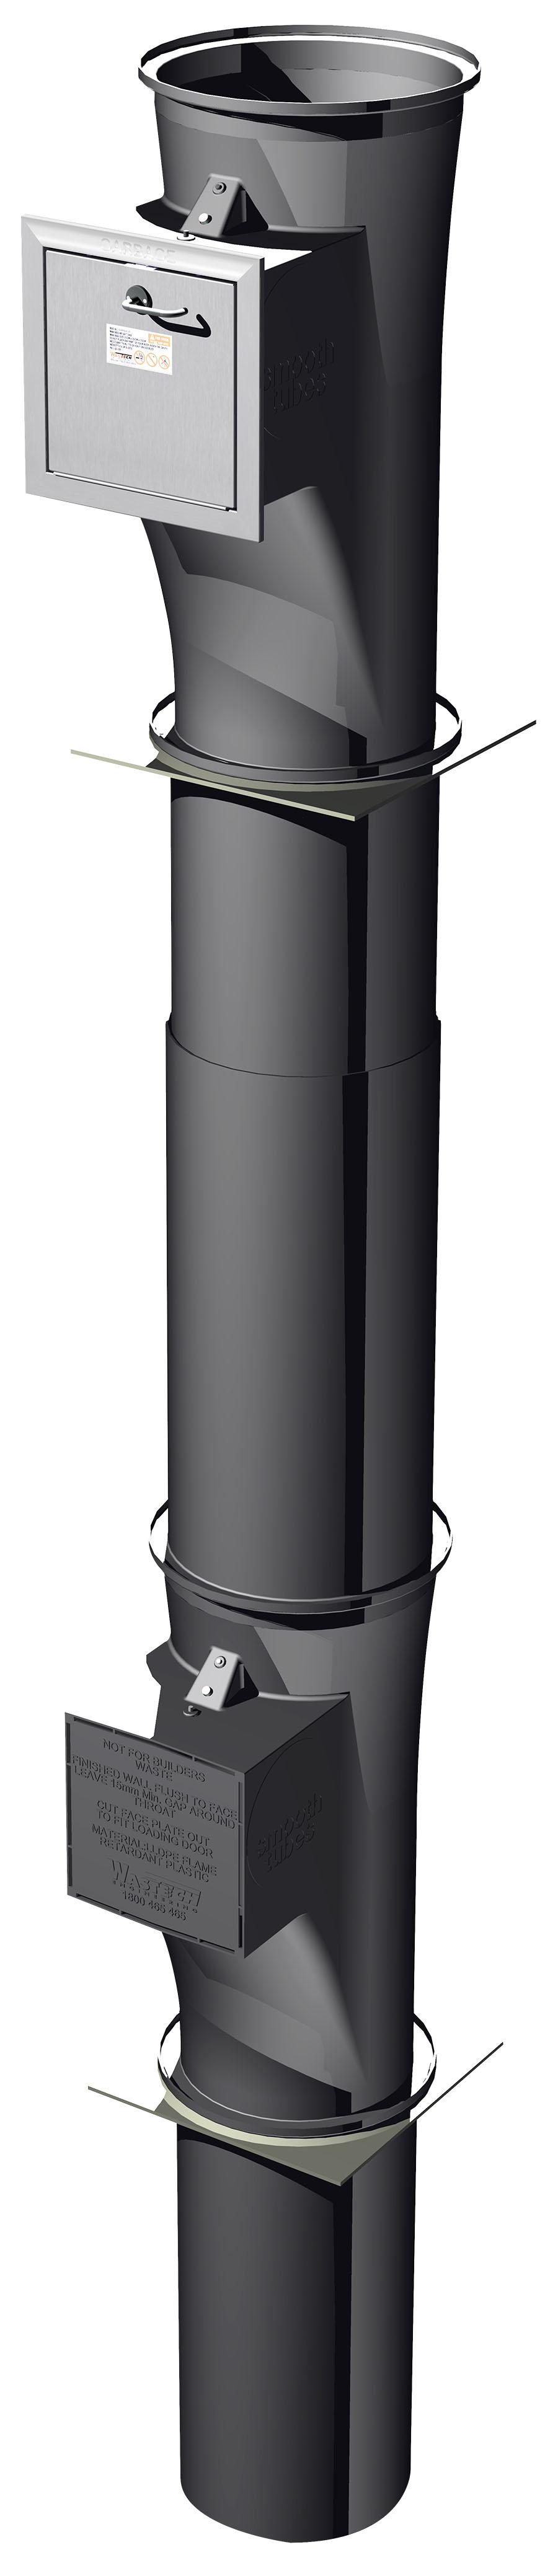 Trash Chute Design : Chutes — wastech engineering